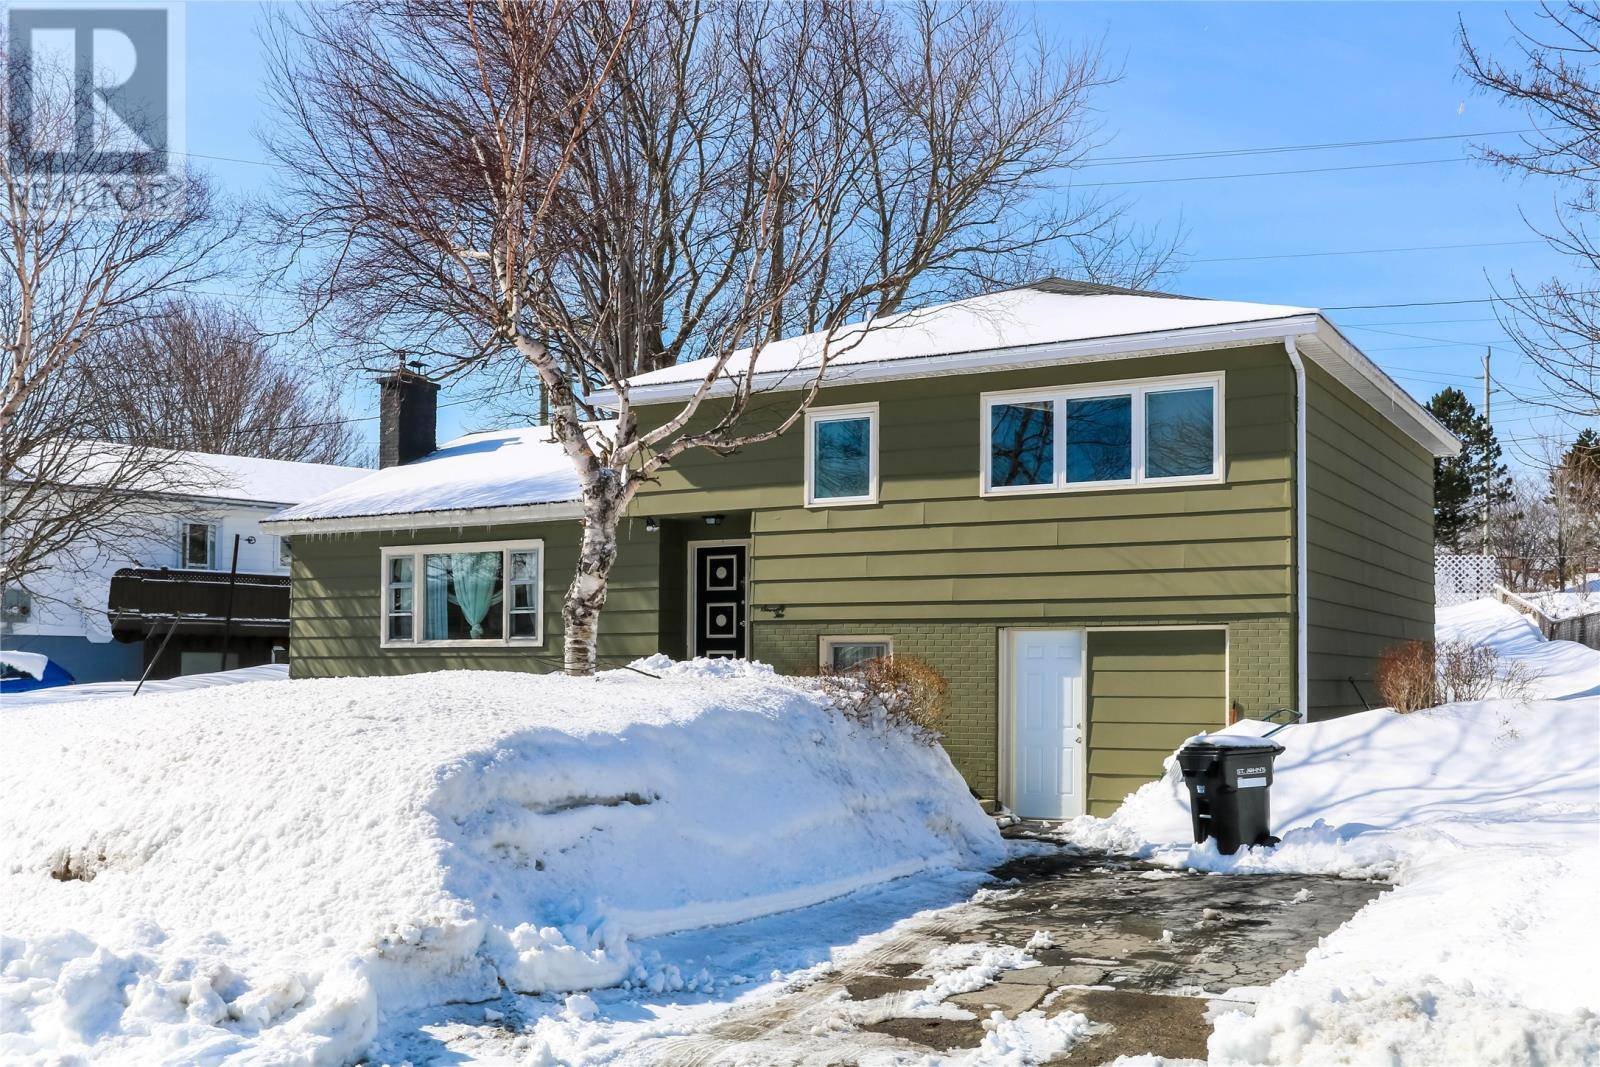 House for sale at 72 Smithville Cres St. John's Newfoundland - MLS: 1212424